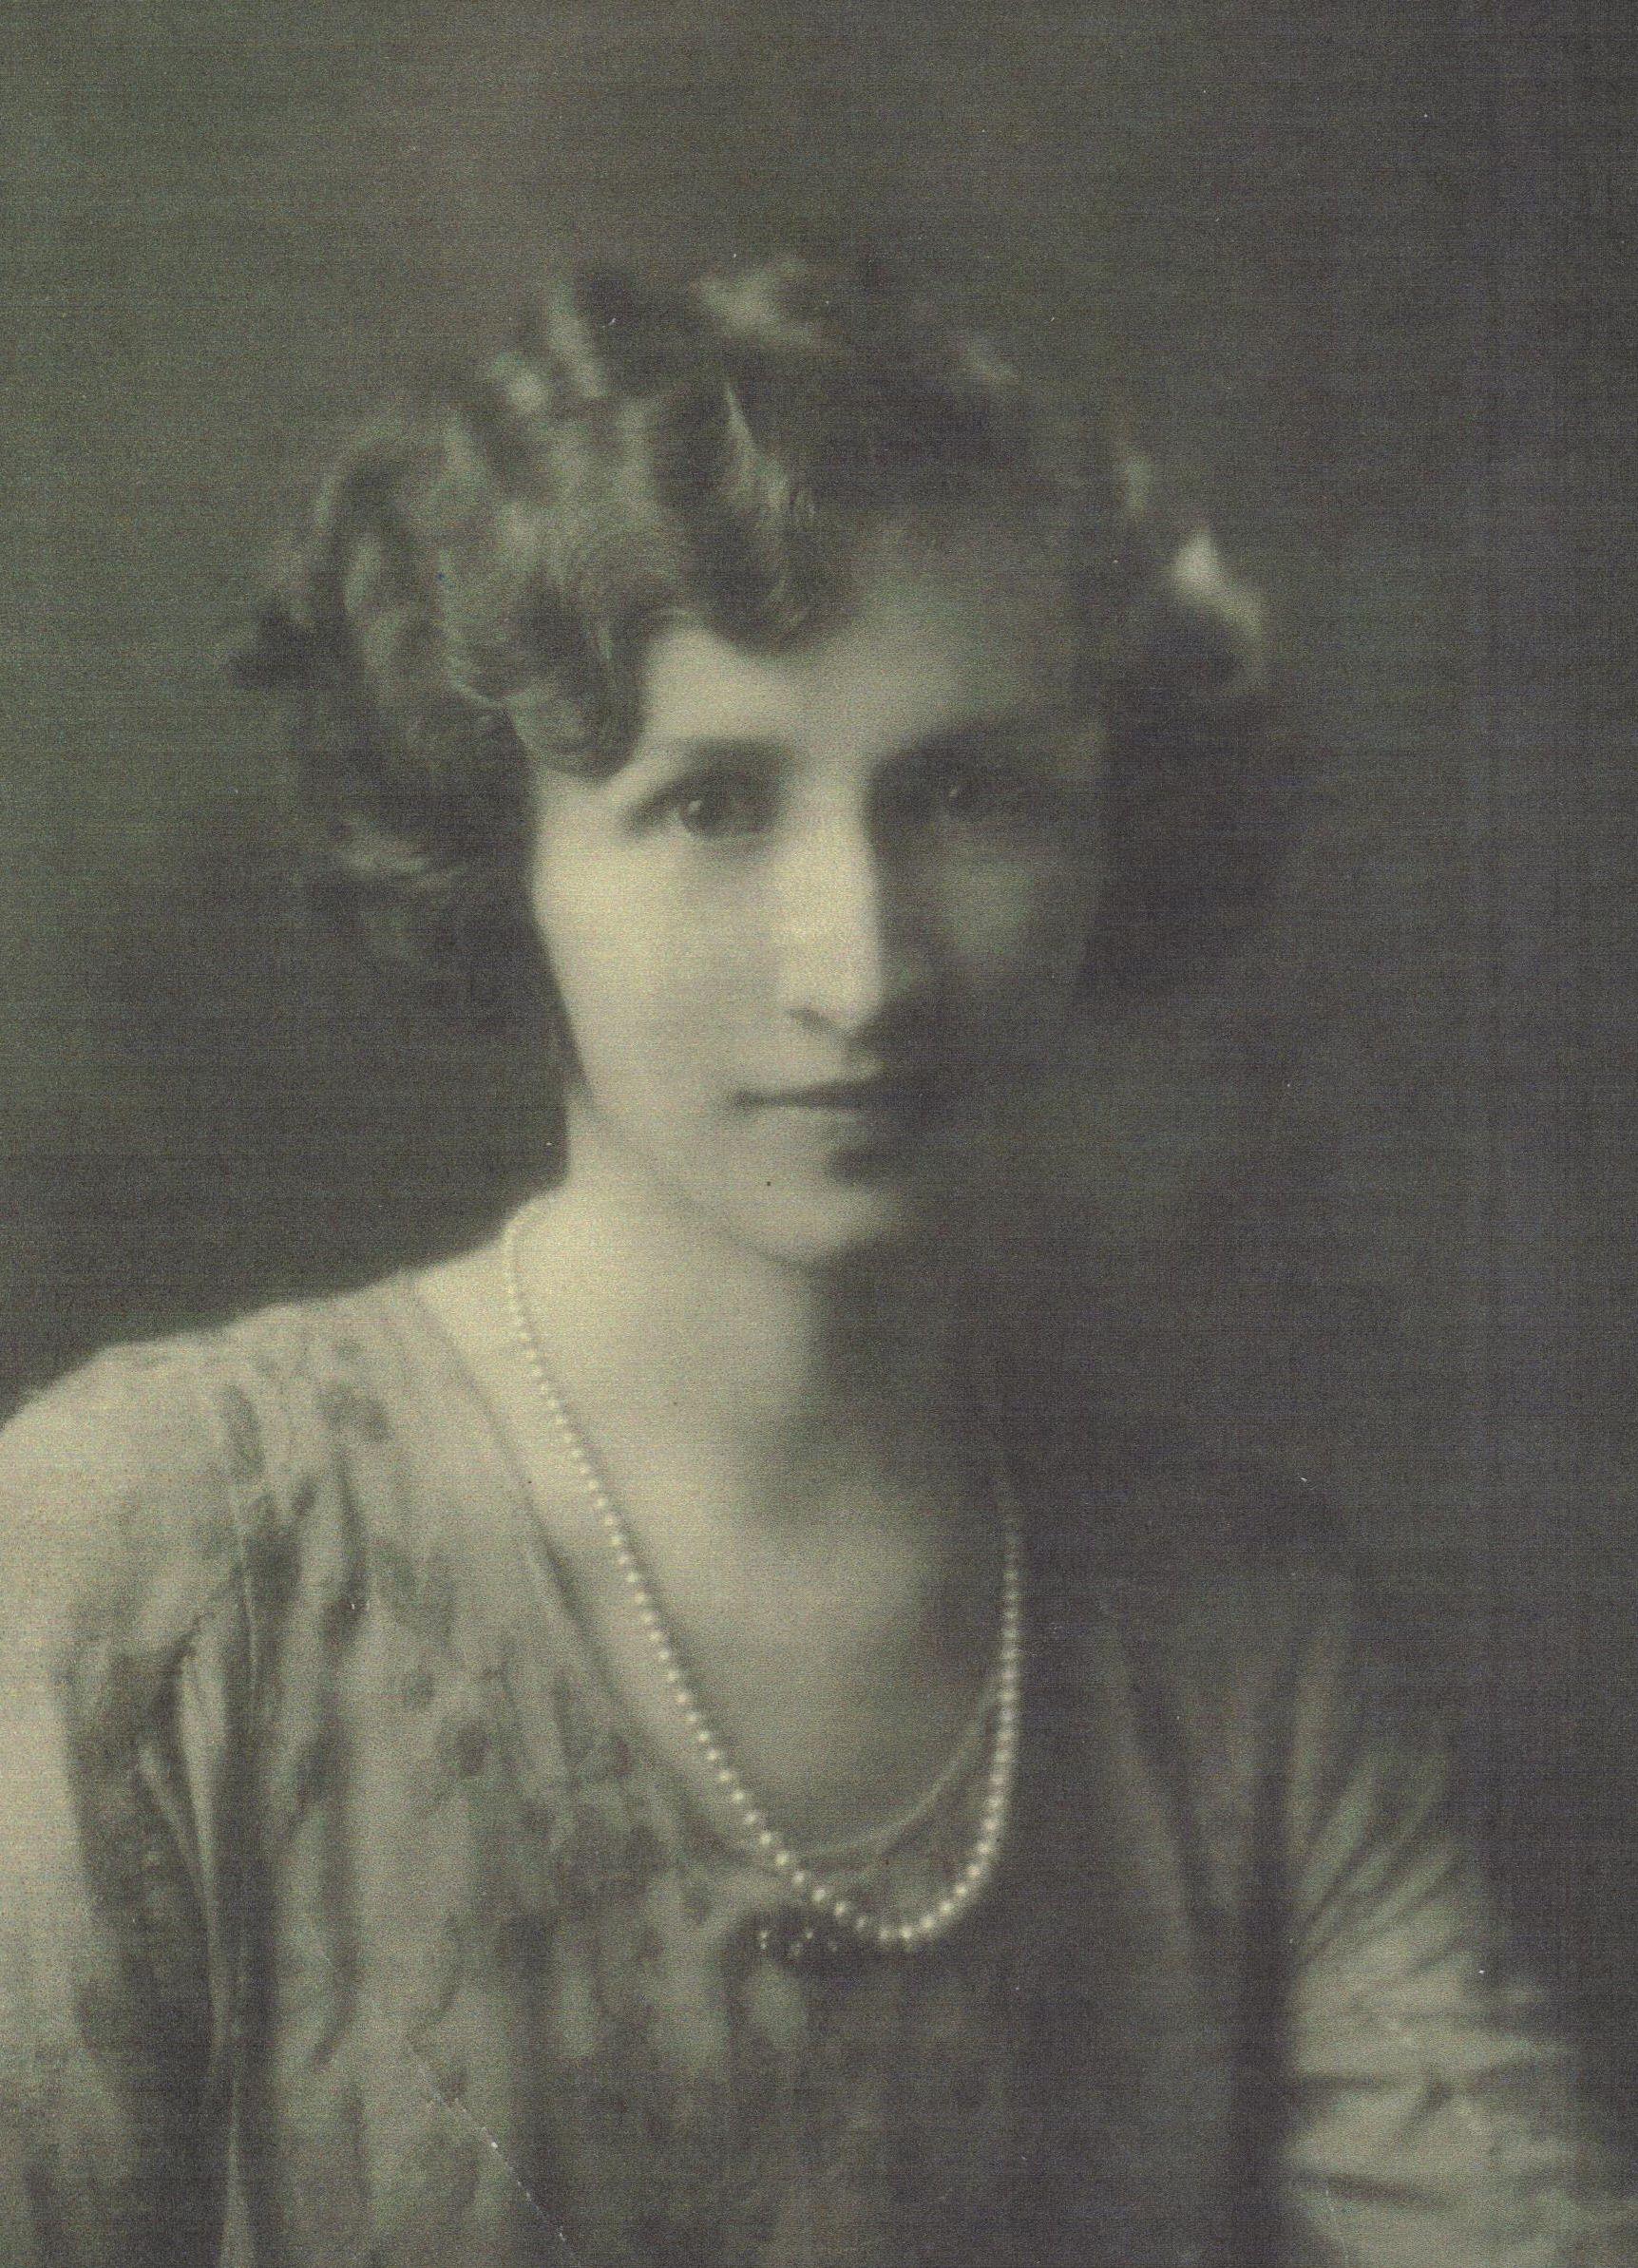 Cannon, Nora Morris